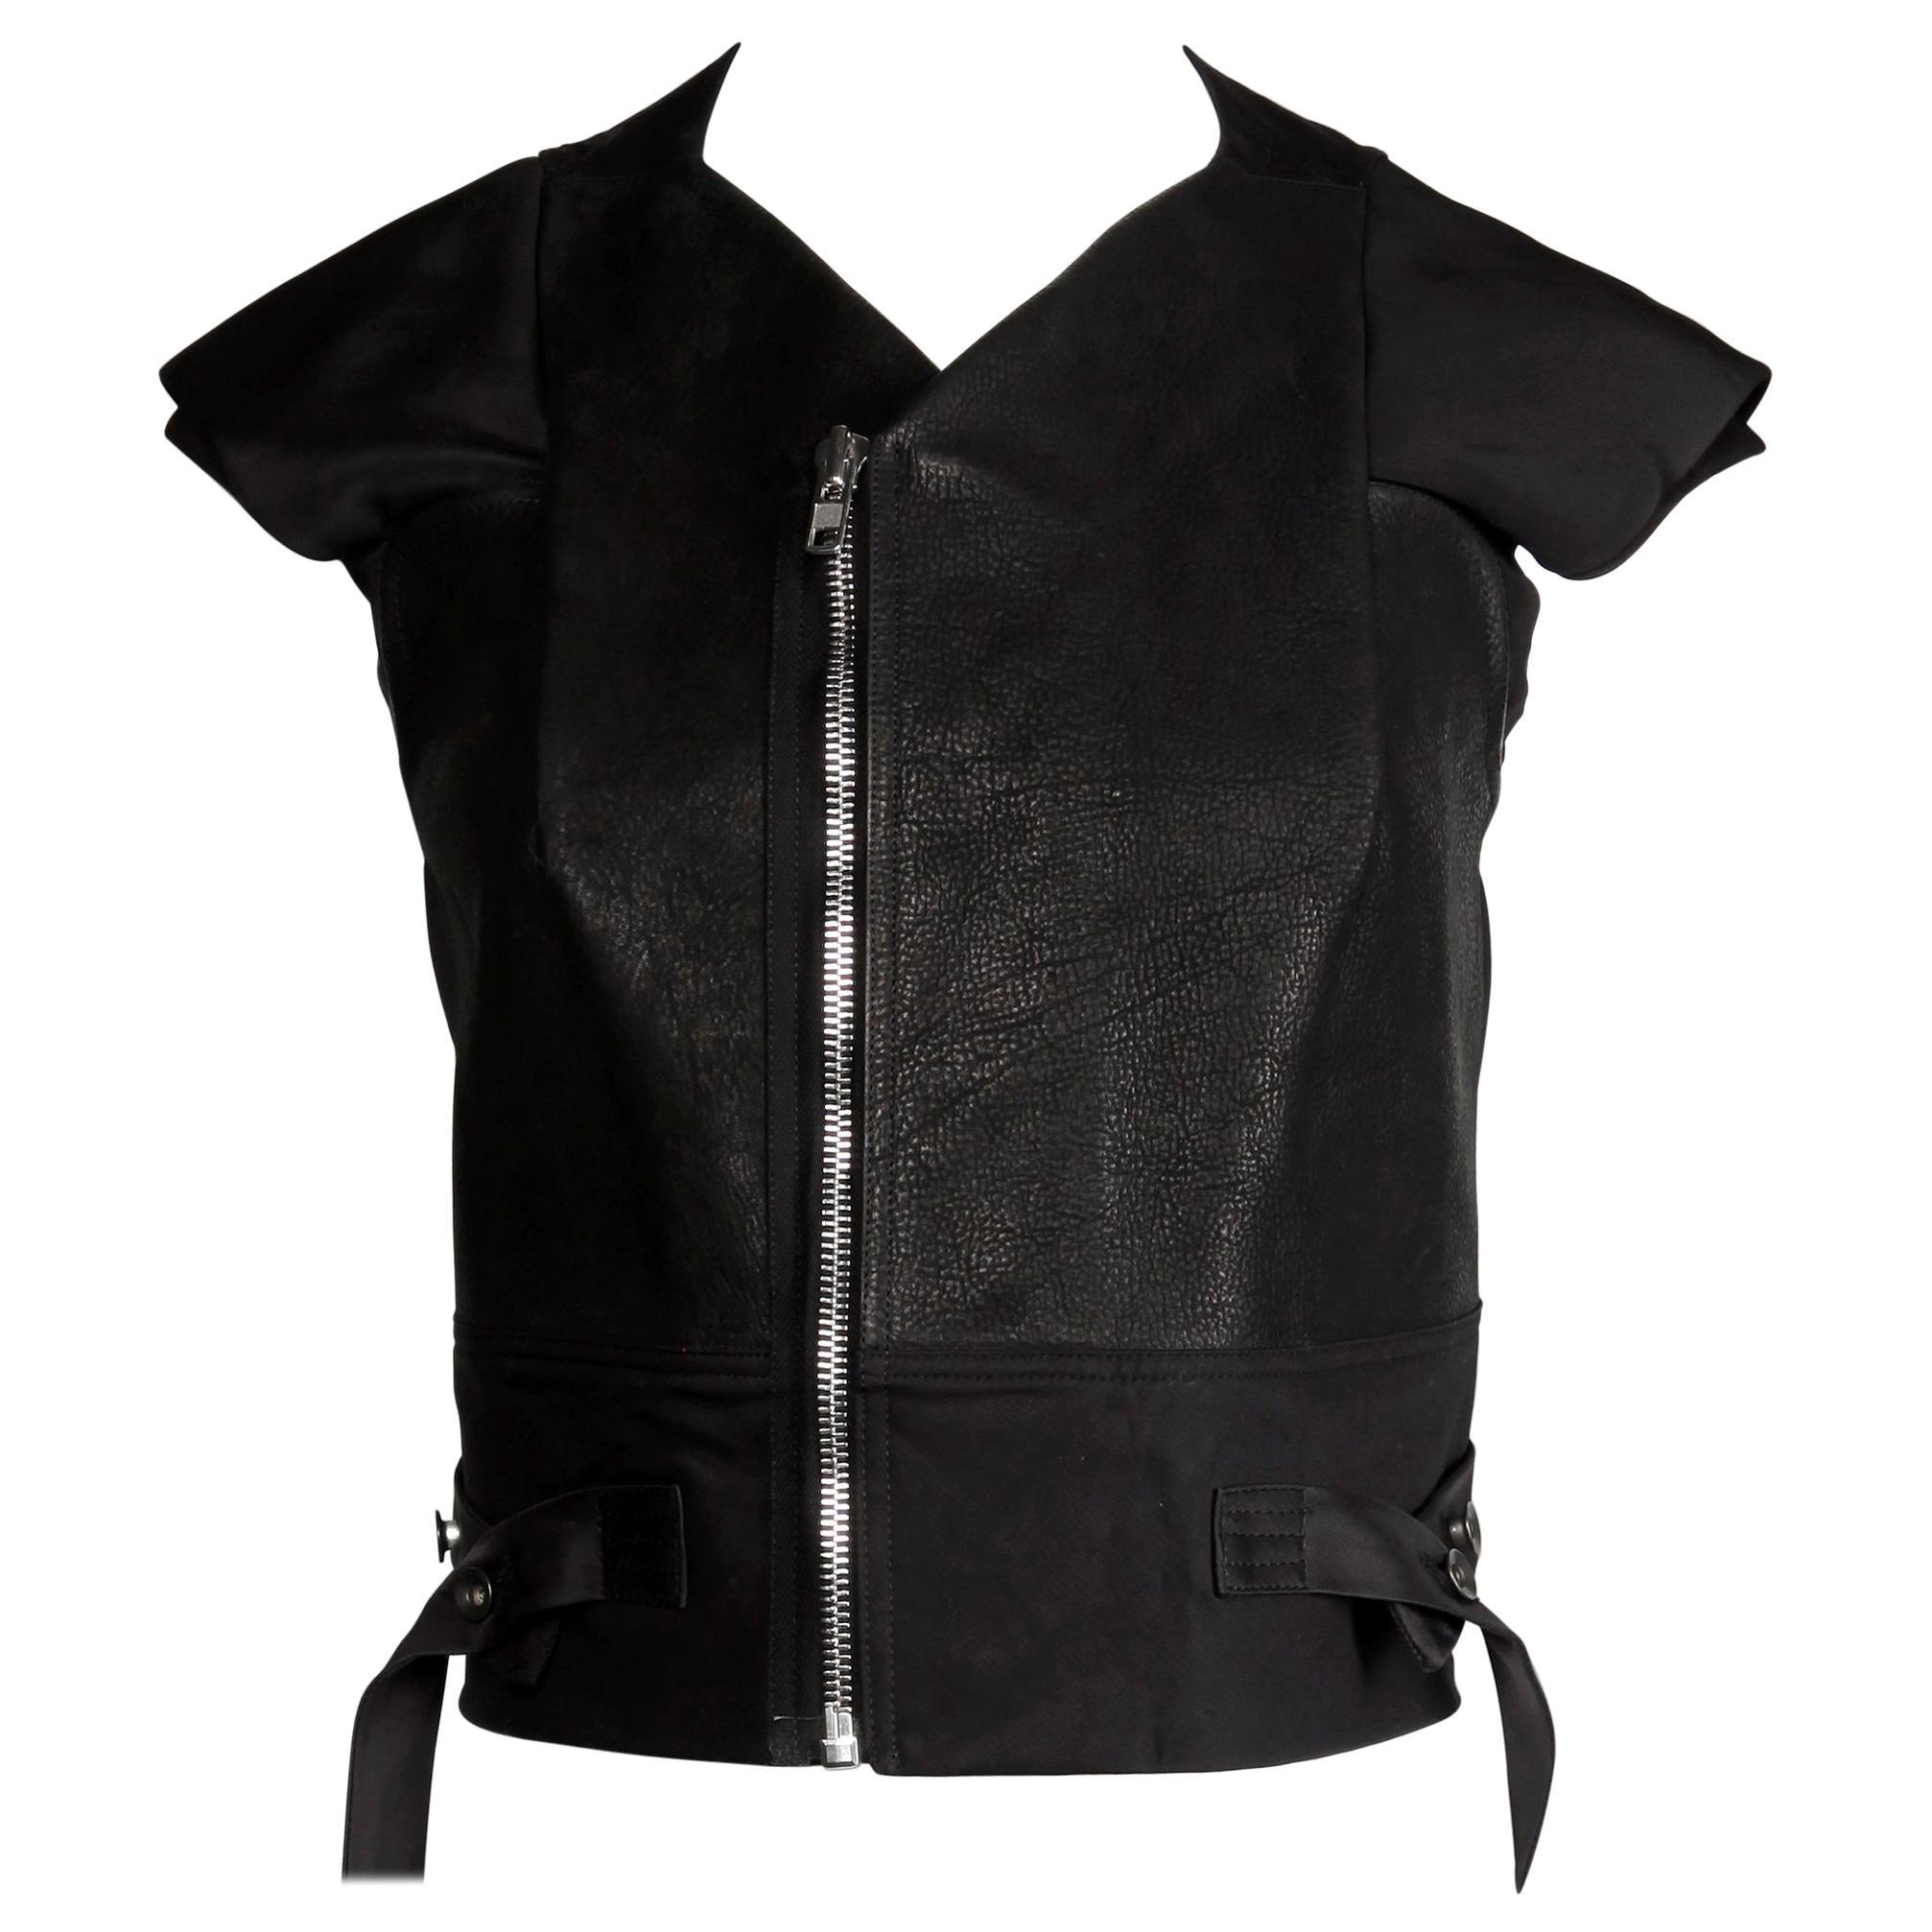 Rick Owens Unworn with Tags S/S 2015 Avant Garde Black Leather Jacket or Vest